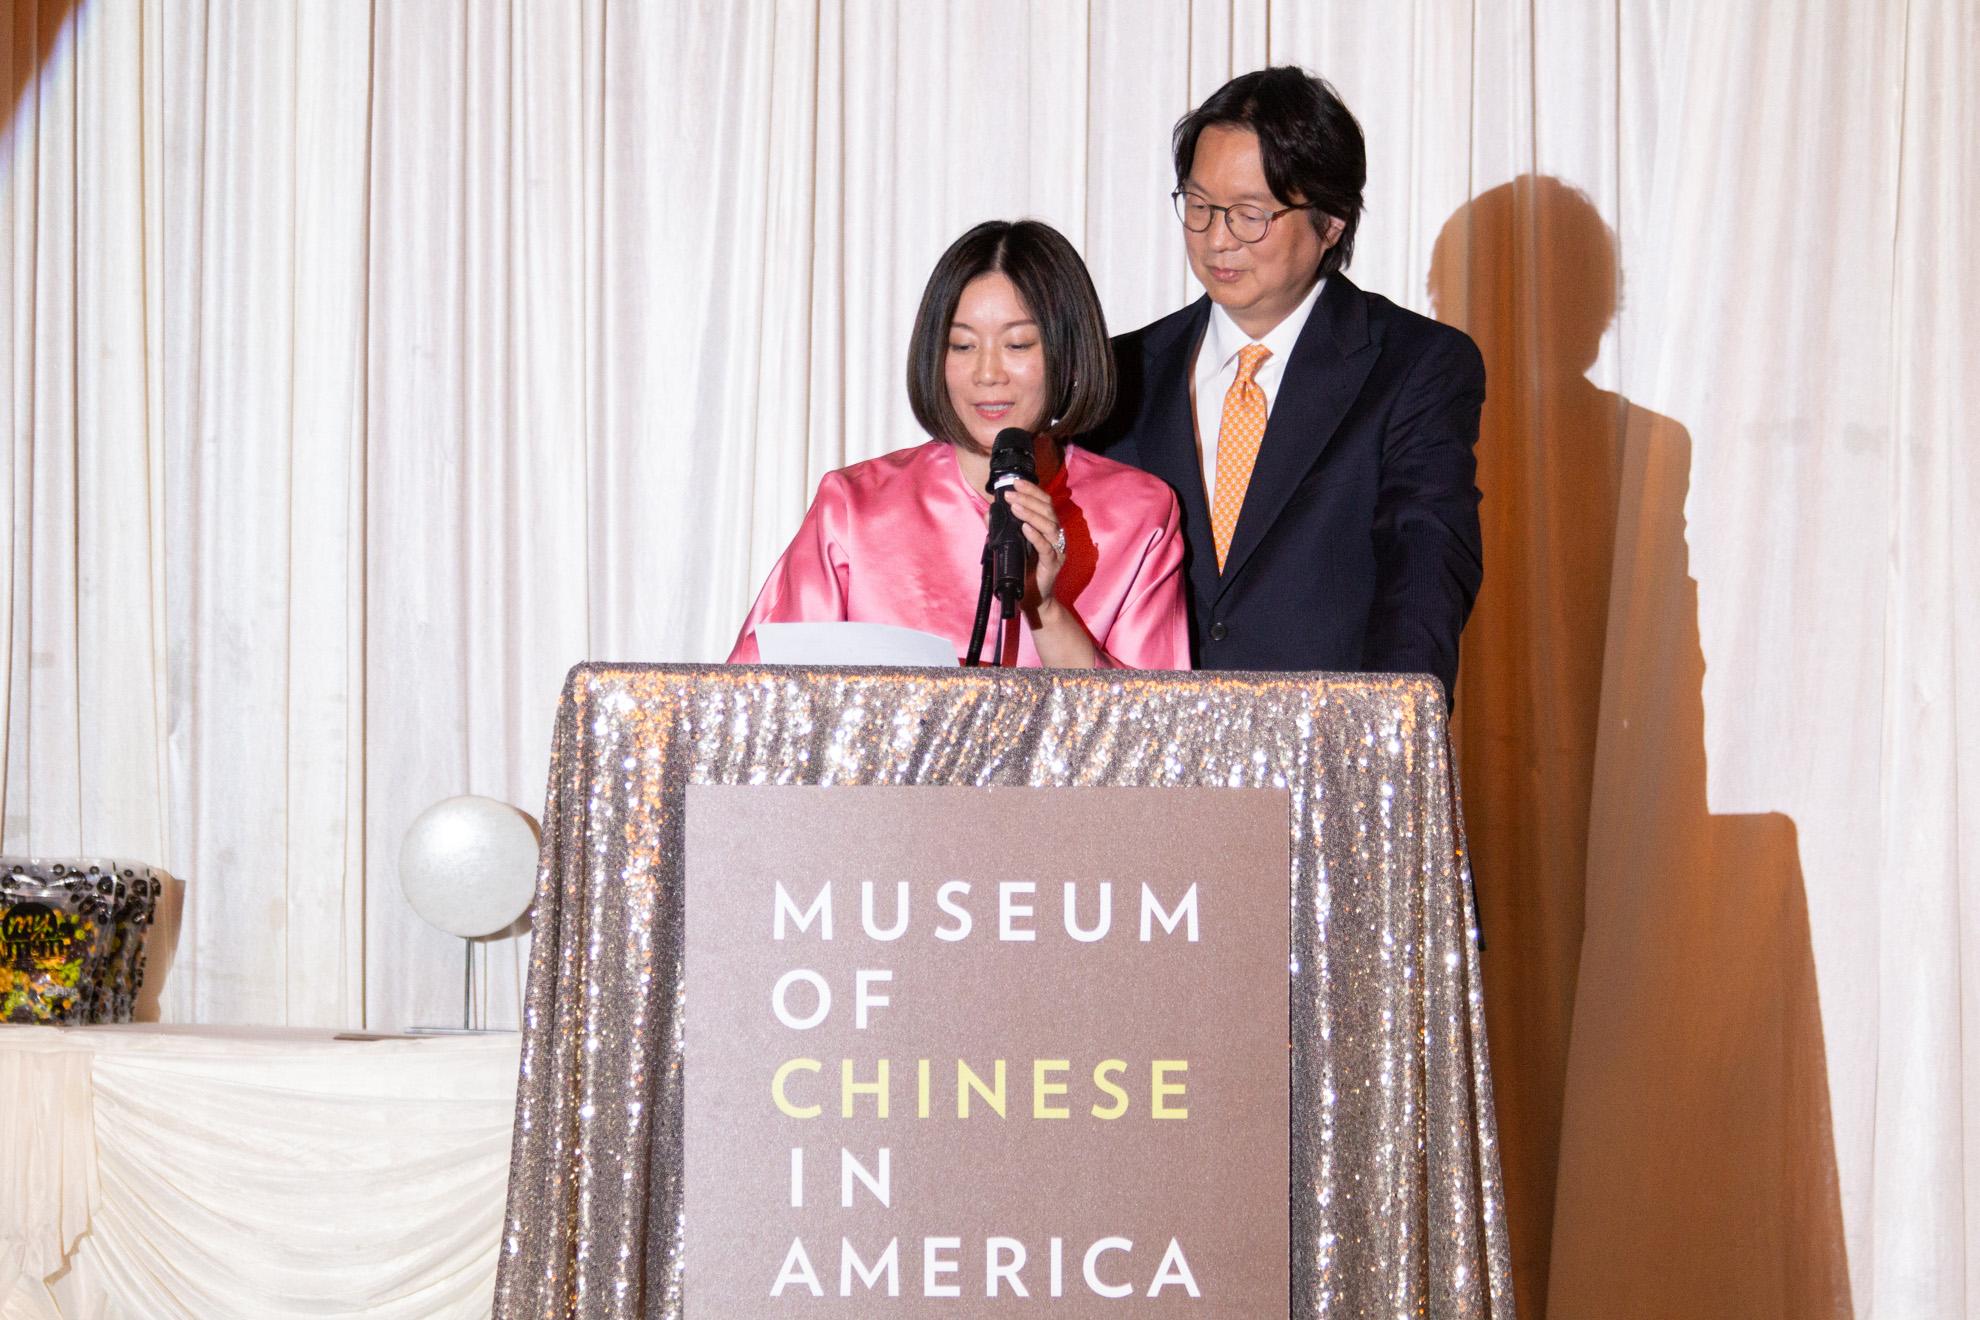 Michelle Koo Hayashi and Dr. Jess Ting